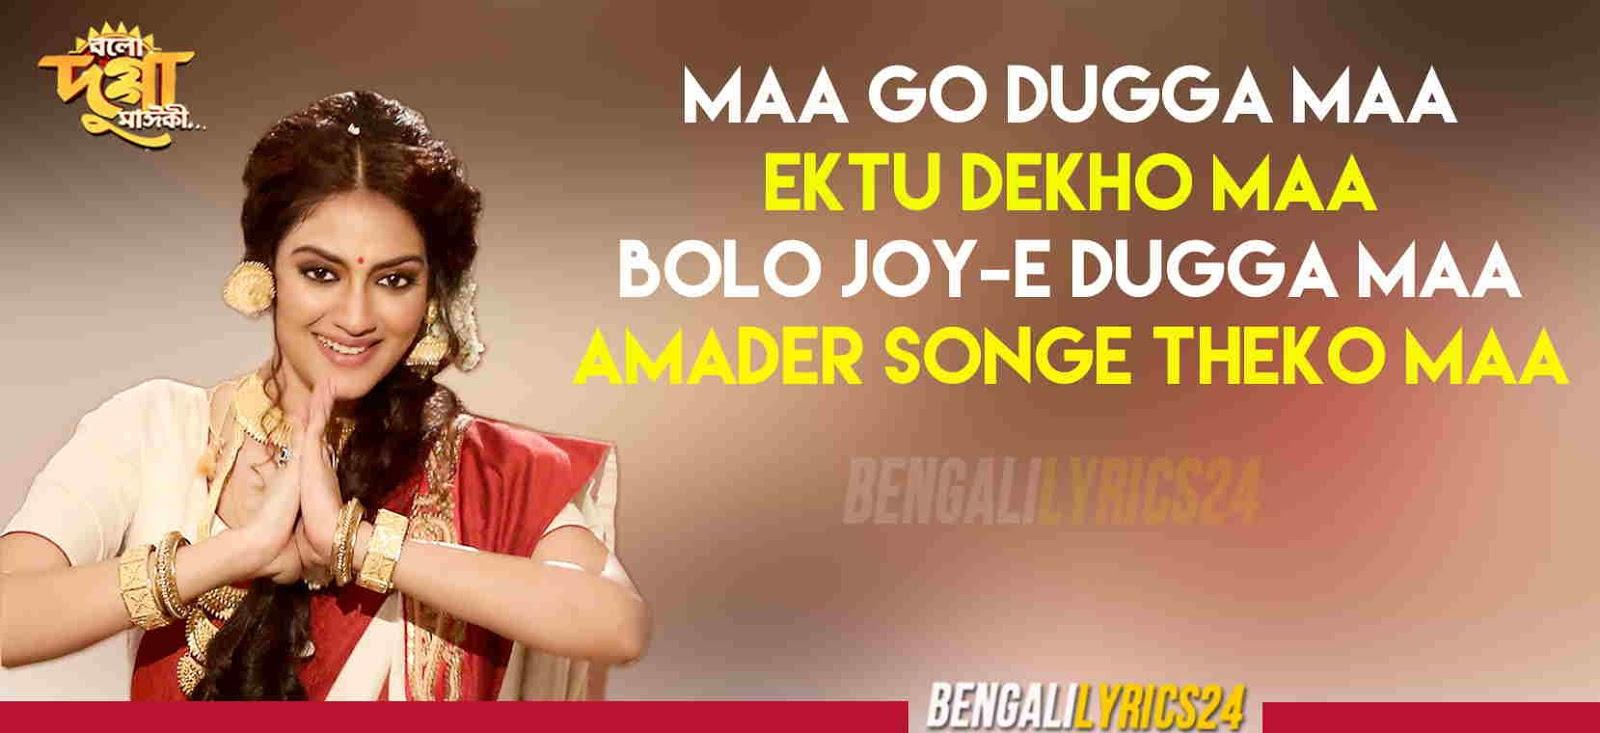 Dugga Ma Lyrics - Maa go dugga ma Ektu dekho ma Bolo joy-e dugga ma Amader songe theko ma